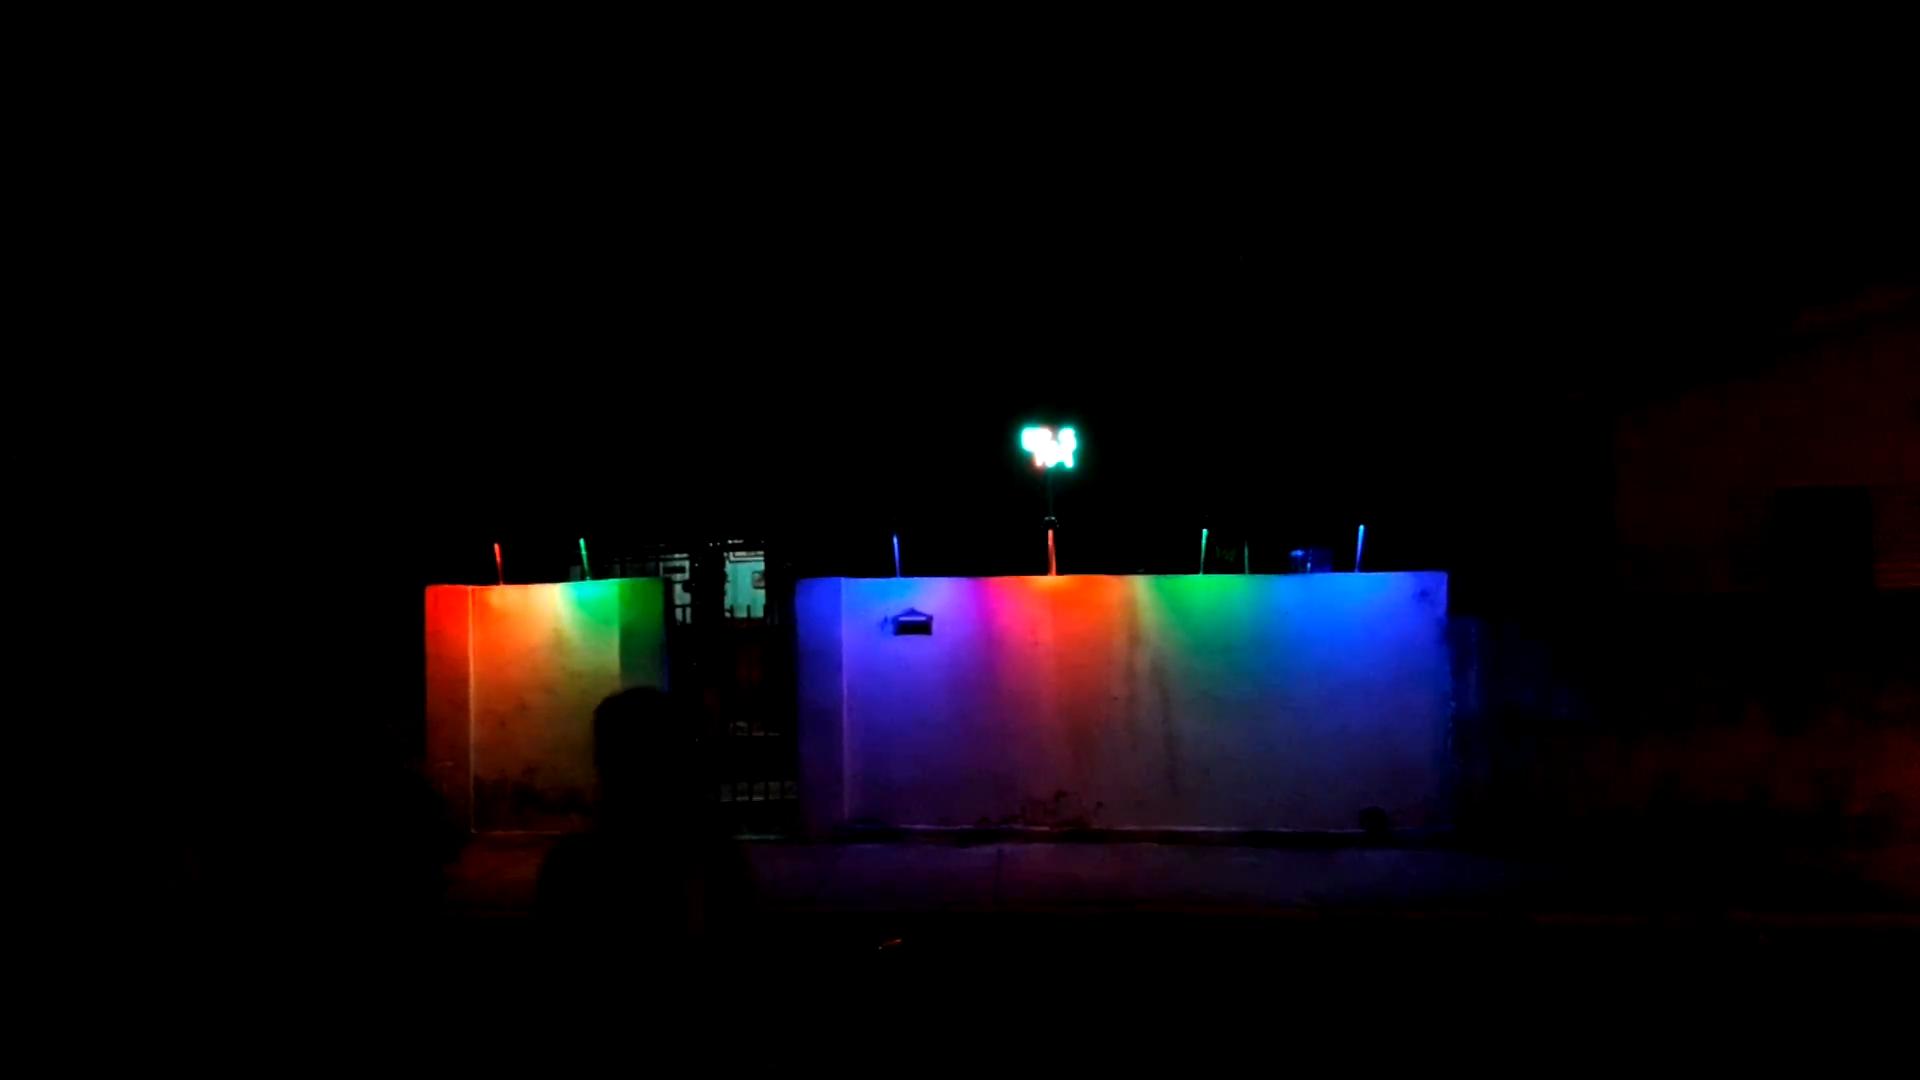 Projeto Show de Luzes de Natal 2017